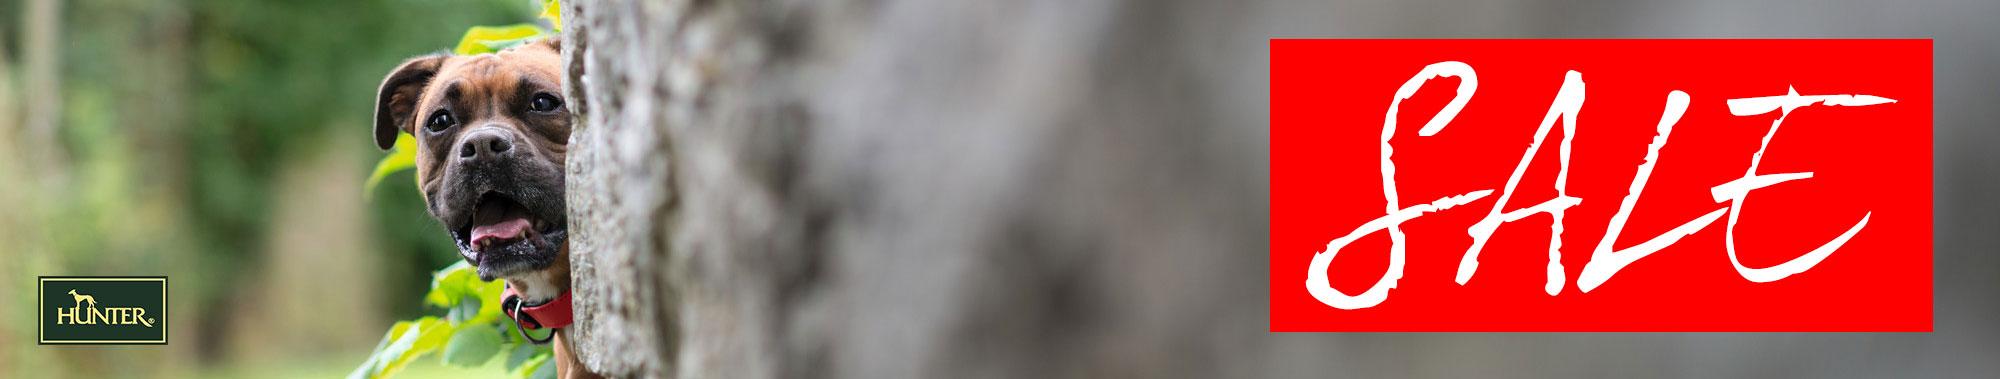 Hunter Hundezubehör SALE